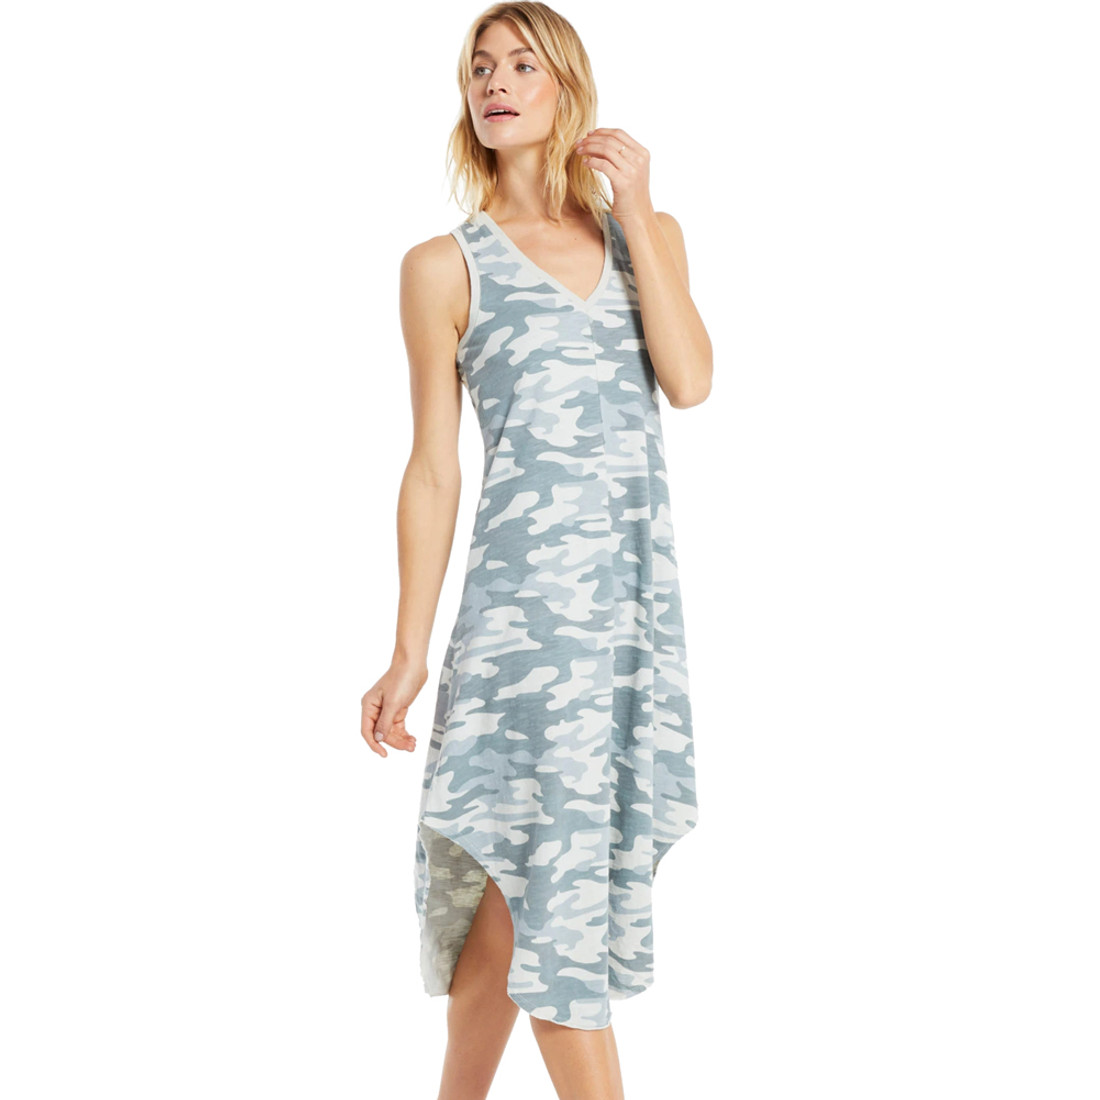 Z Supply Camo Reverie Midi Dress